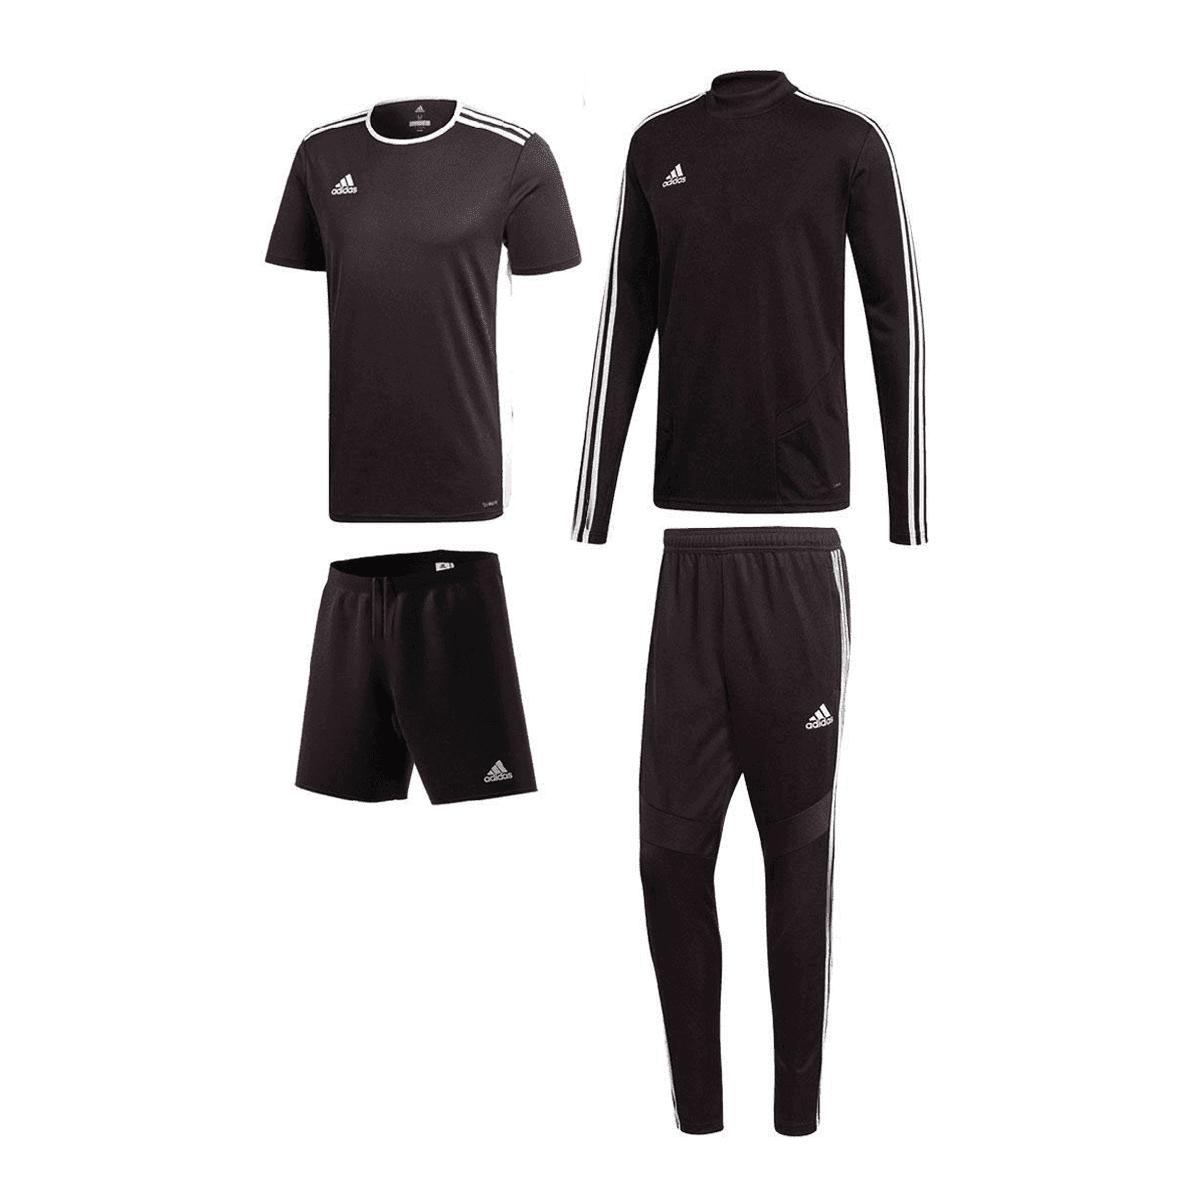 cb0c3502b28 Adidas trainingsset Tiro 19 4-delig zwart/wit - Voetbal shop